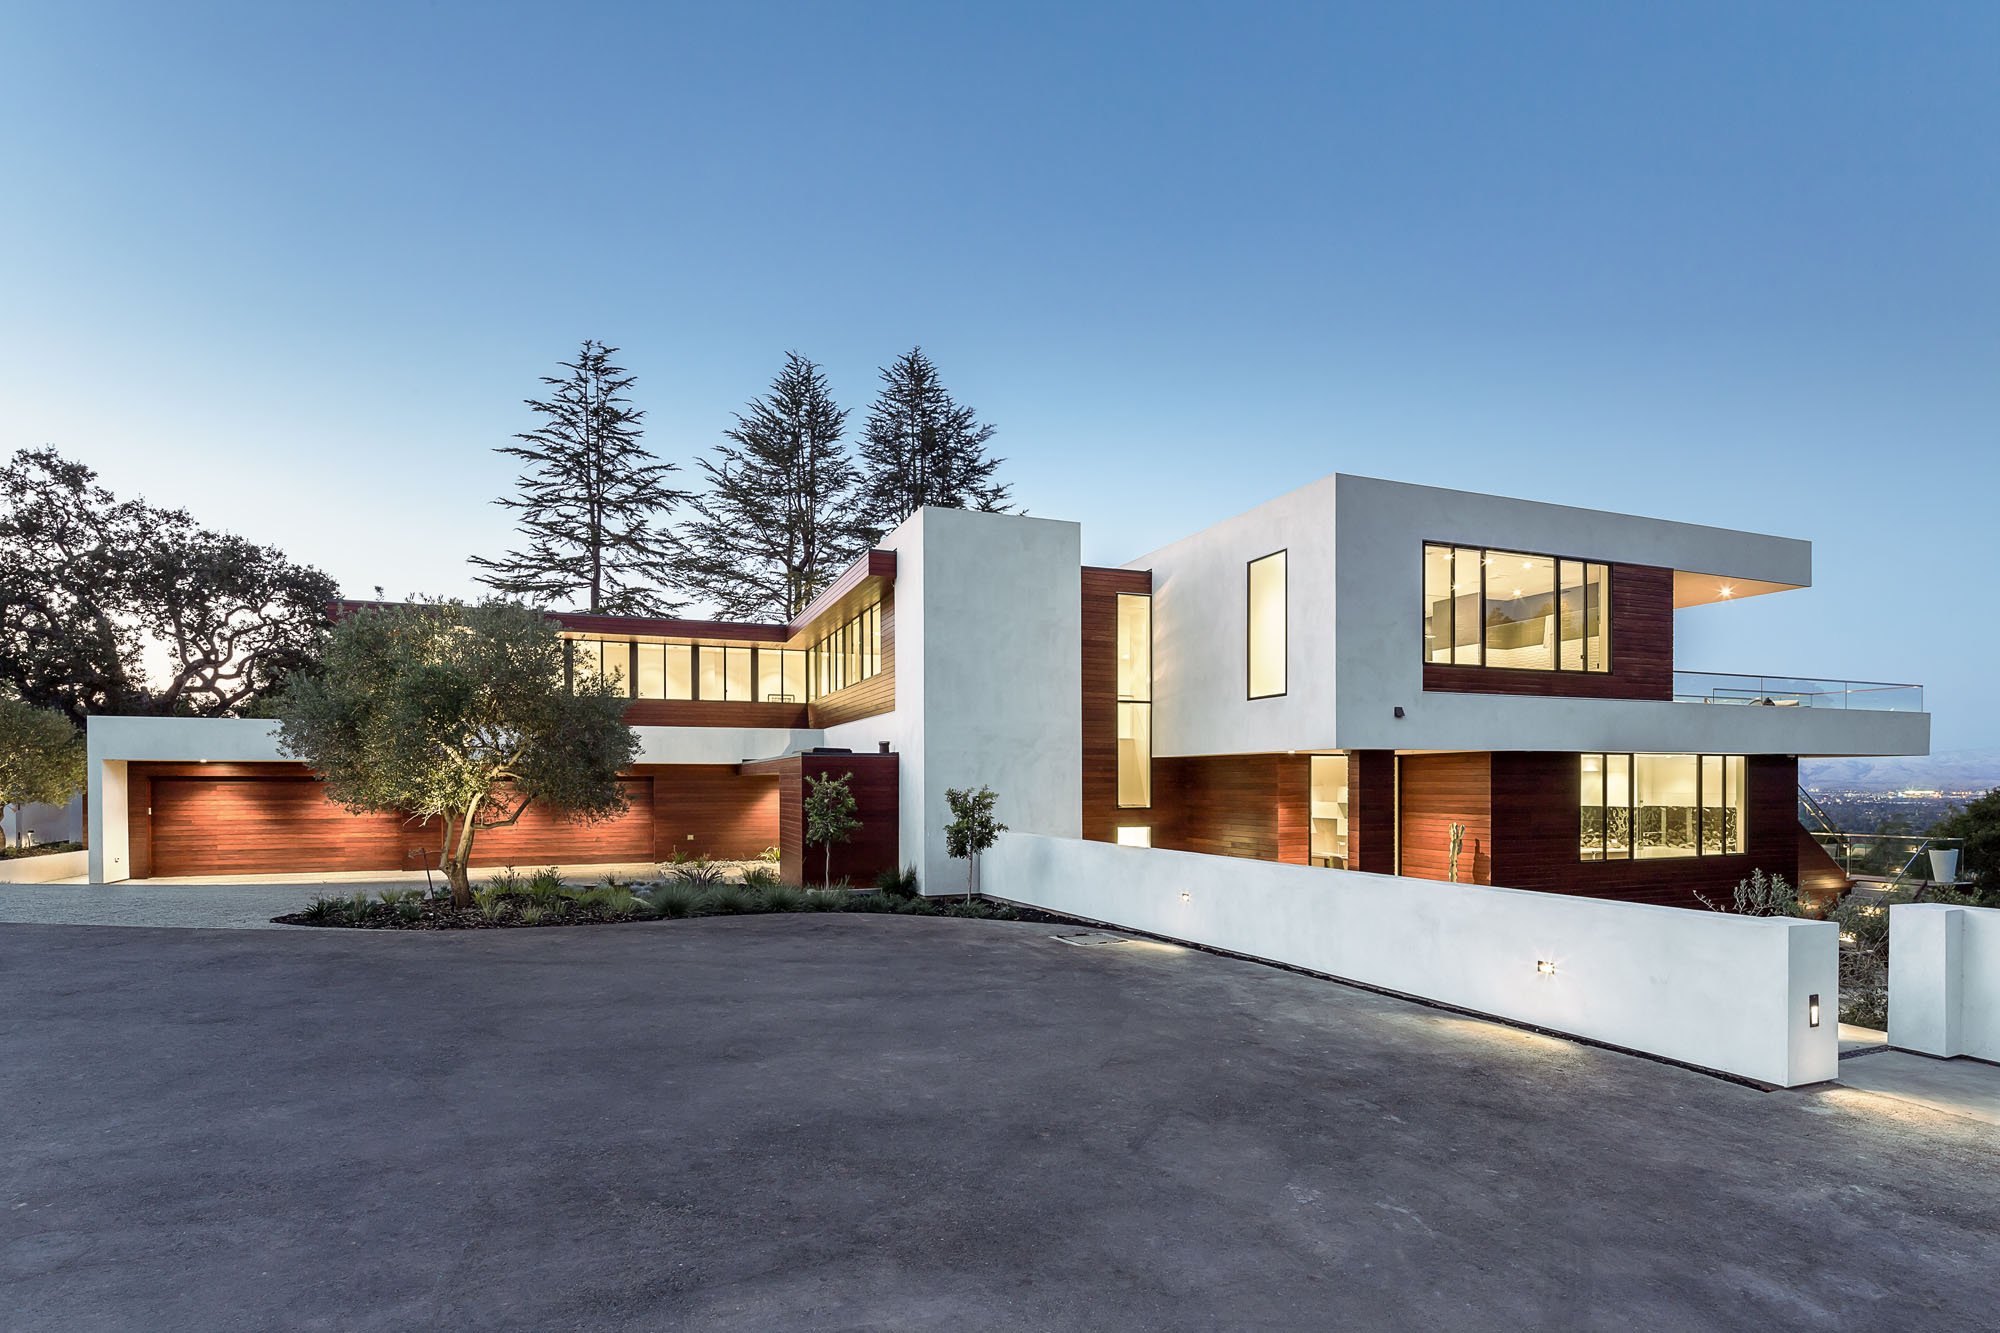 Modern Home Exterior Design Ideas 2017: 2017 Silicon Valley MA+DS Modern Home Tour